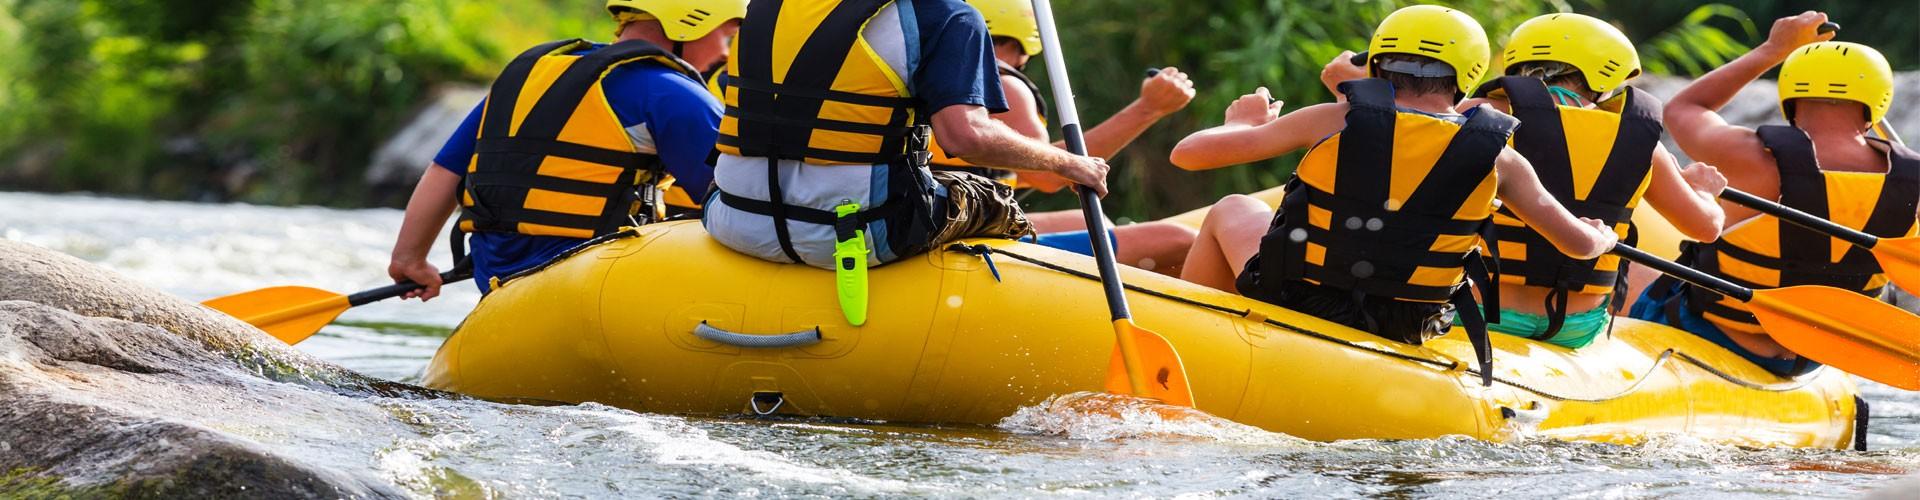 Rafting im Berchtesgadener Land